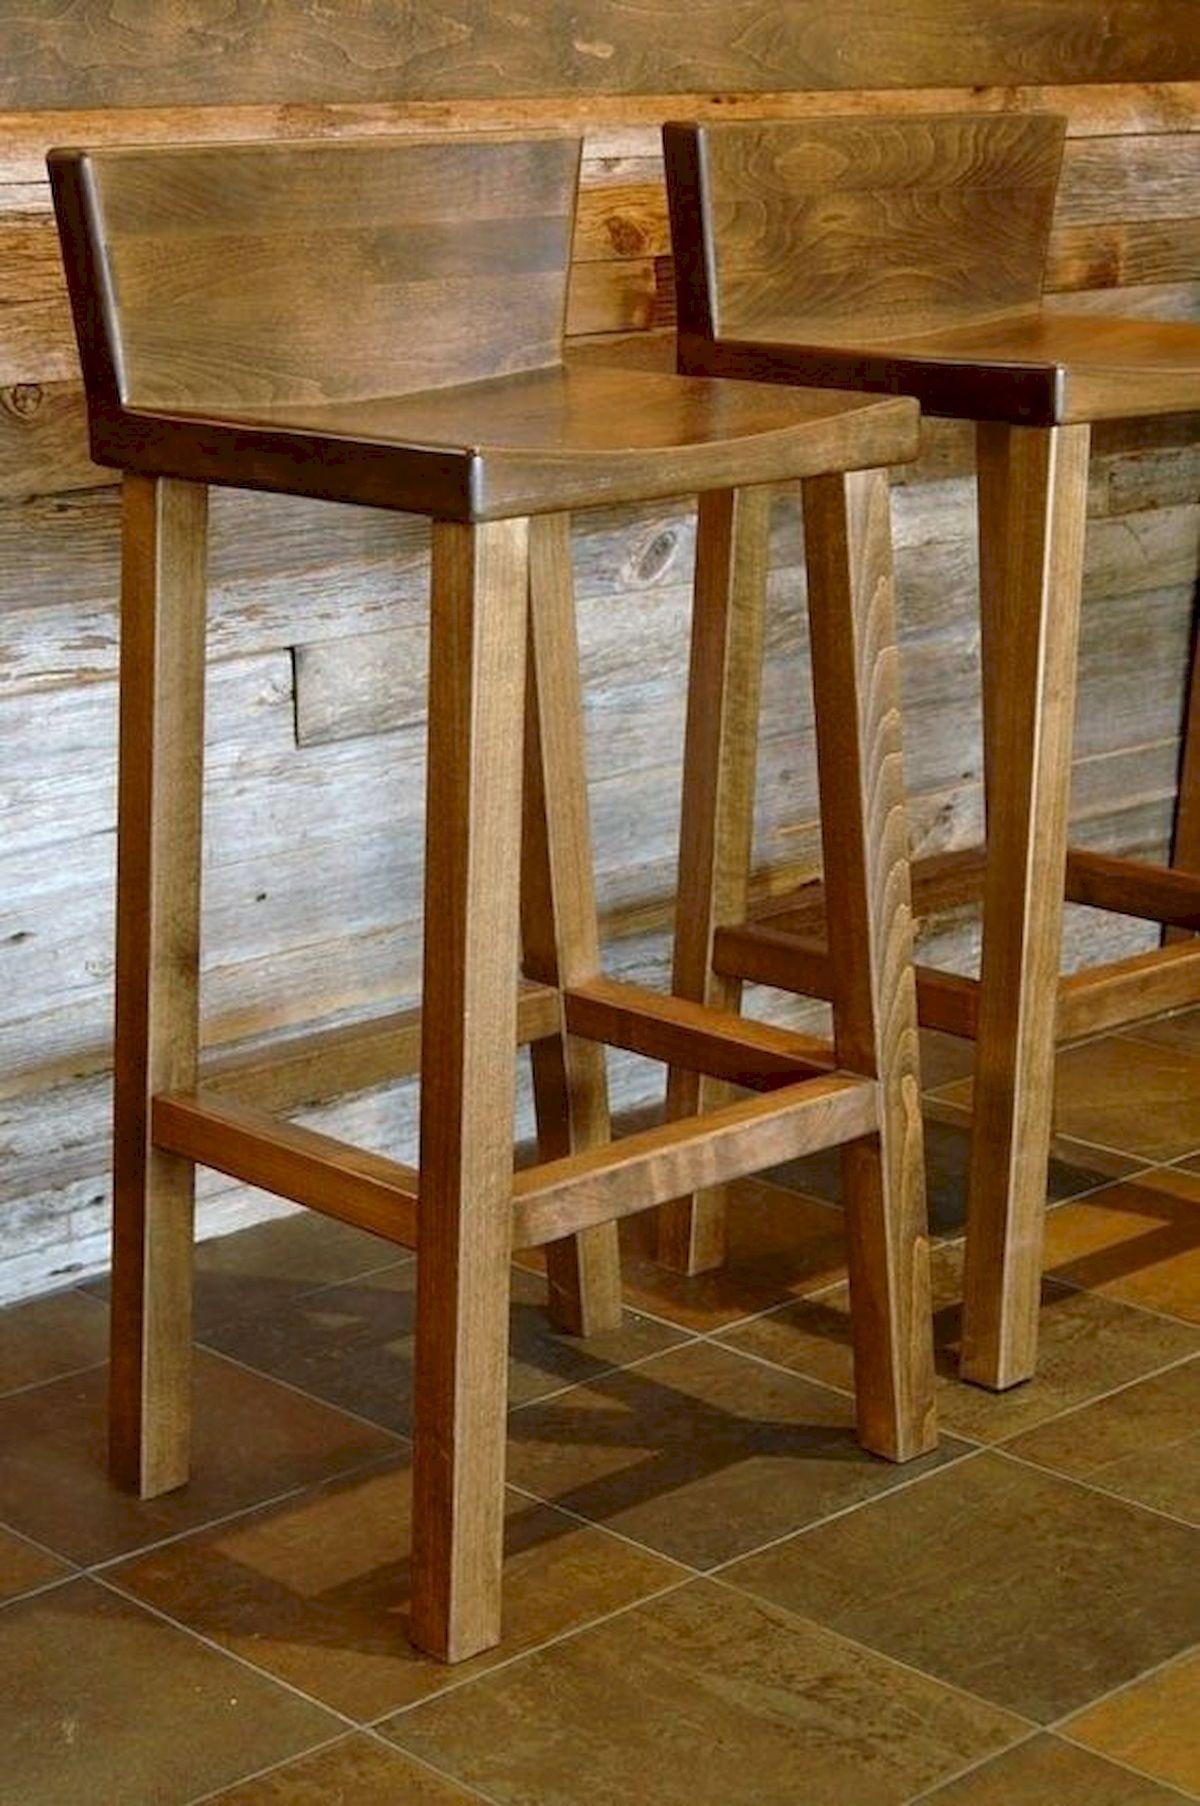 The Best Choice Of Farmhouse Chairs Farmhouse Chairs Wood Bar Stools Wooden Bar Stools